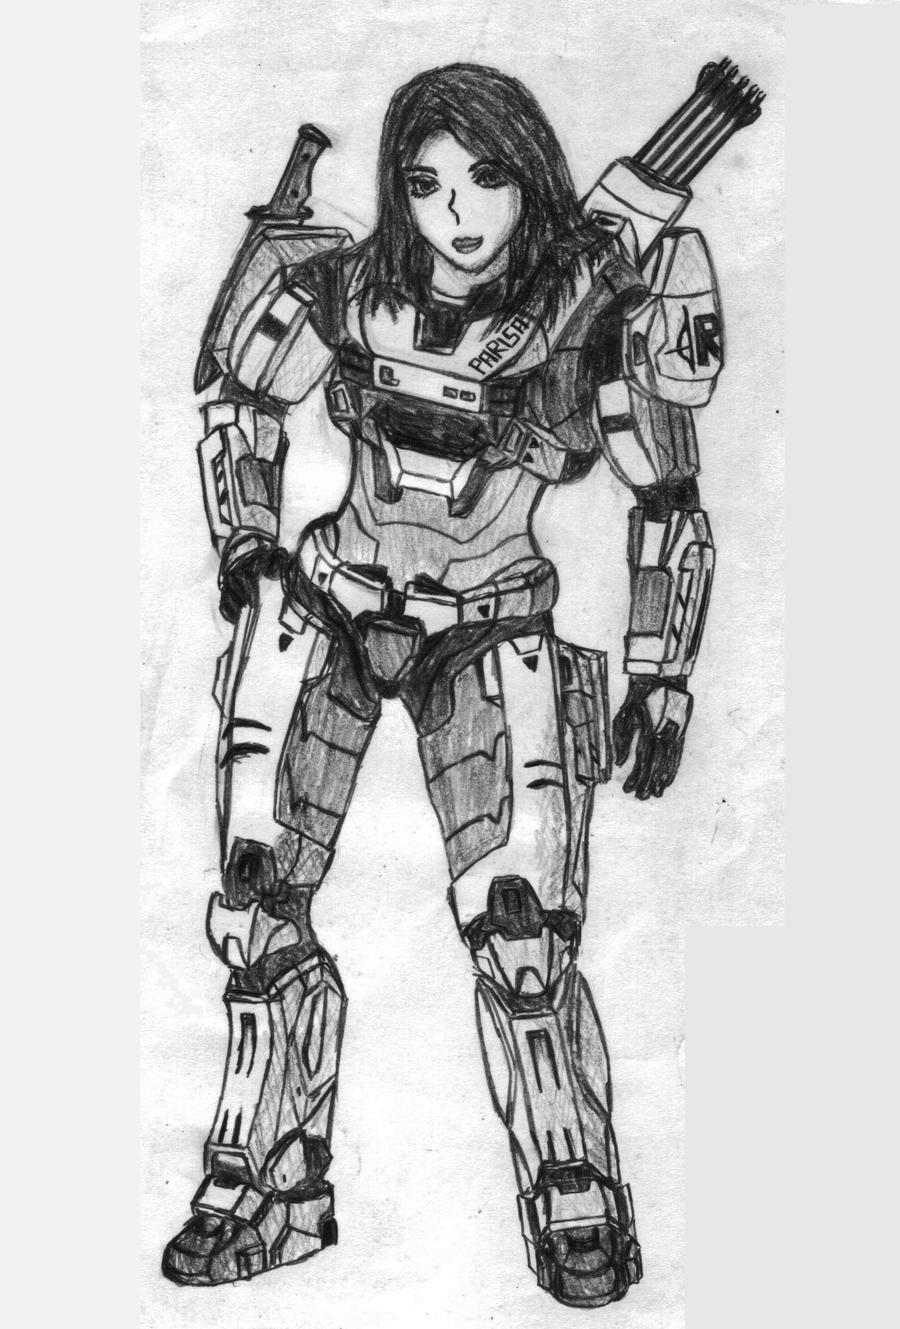 Crossbow Spartan Girl by Sacrafire